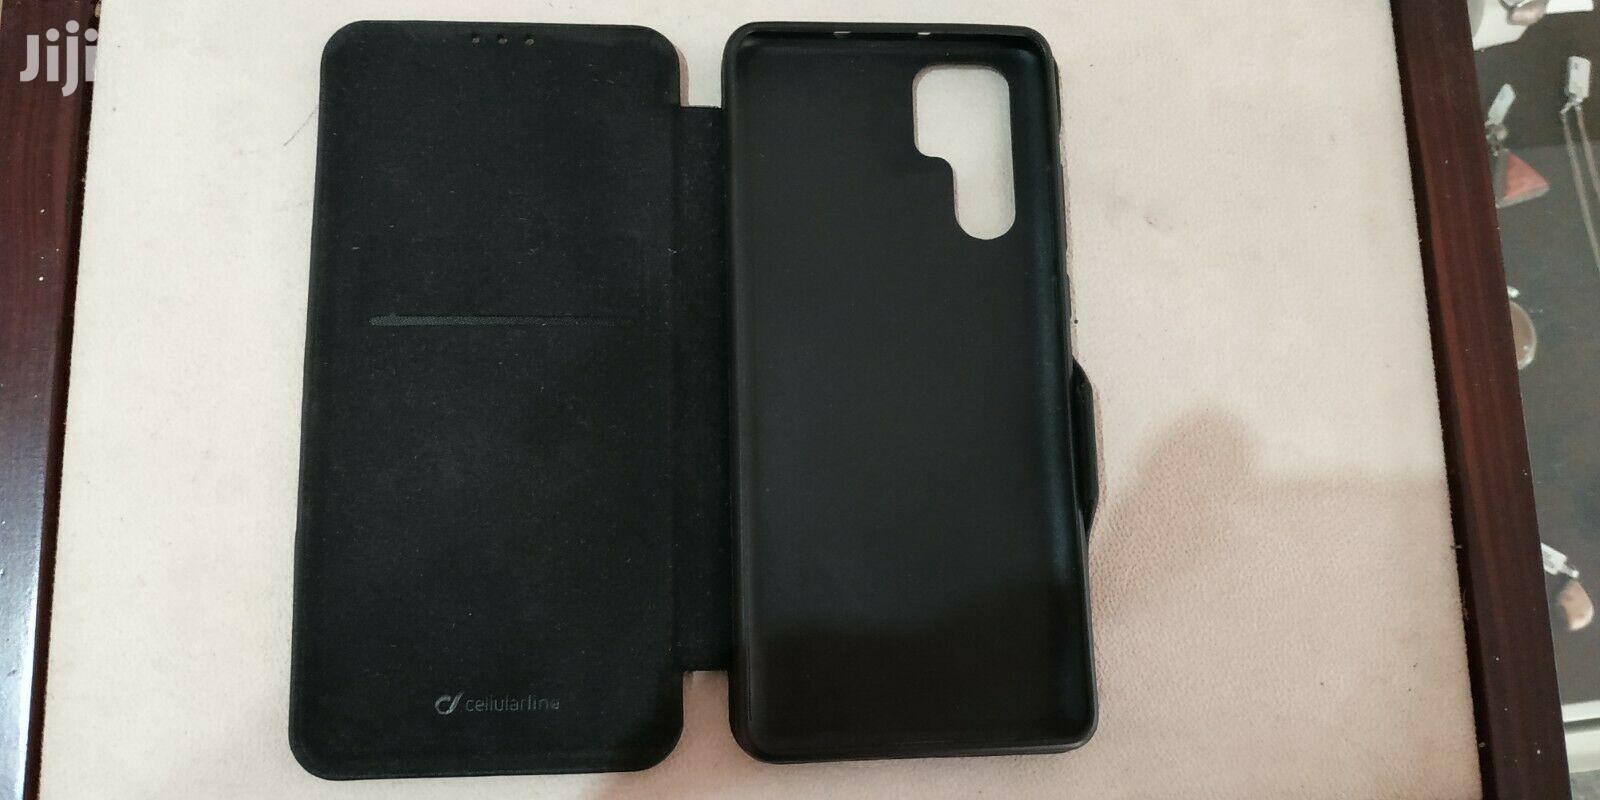 New Huawei P20 Pro 256 GB Black | Mobile Phones for sale in Nairobi Central, Nairobi, Kenya